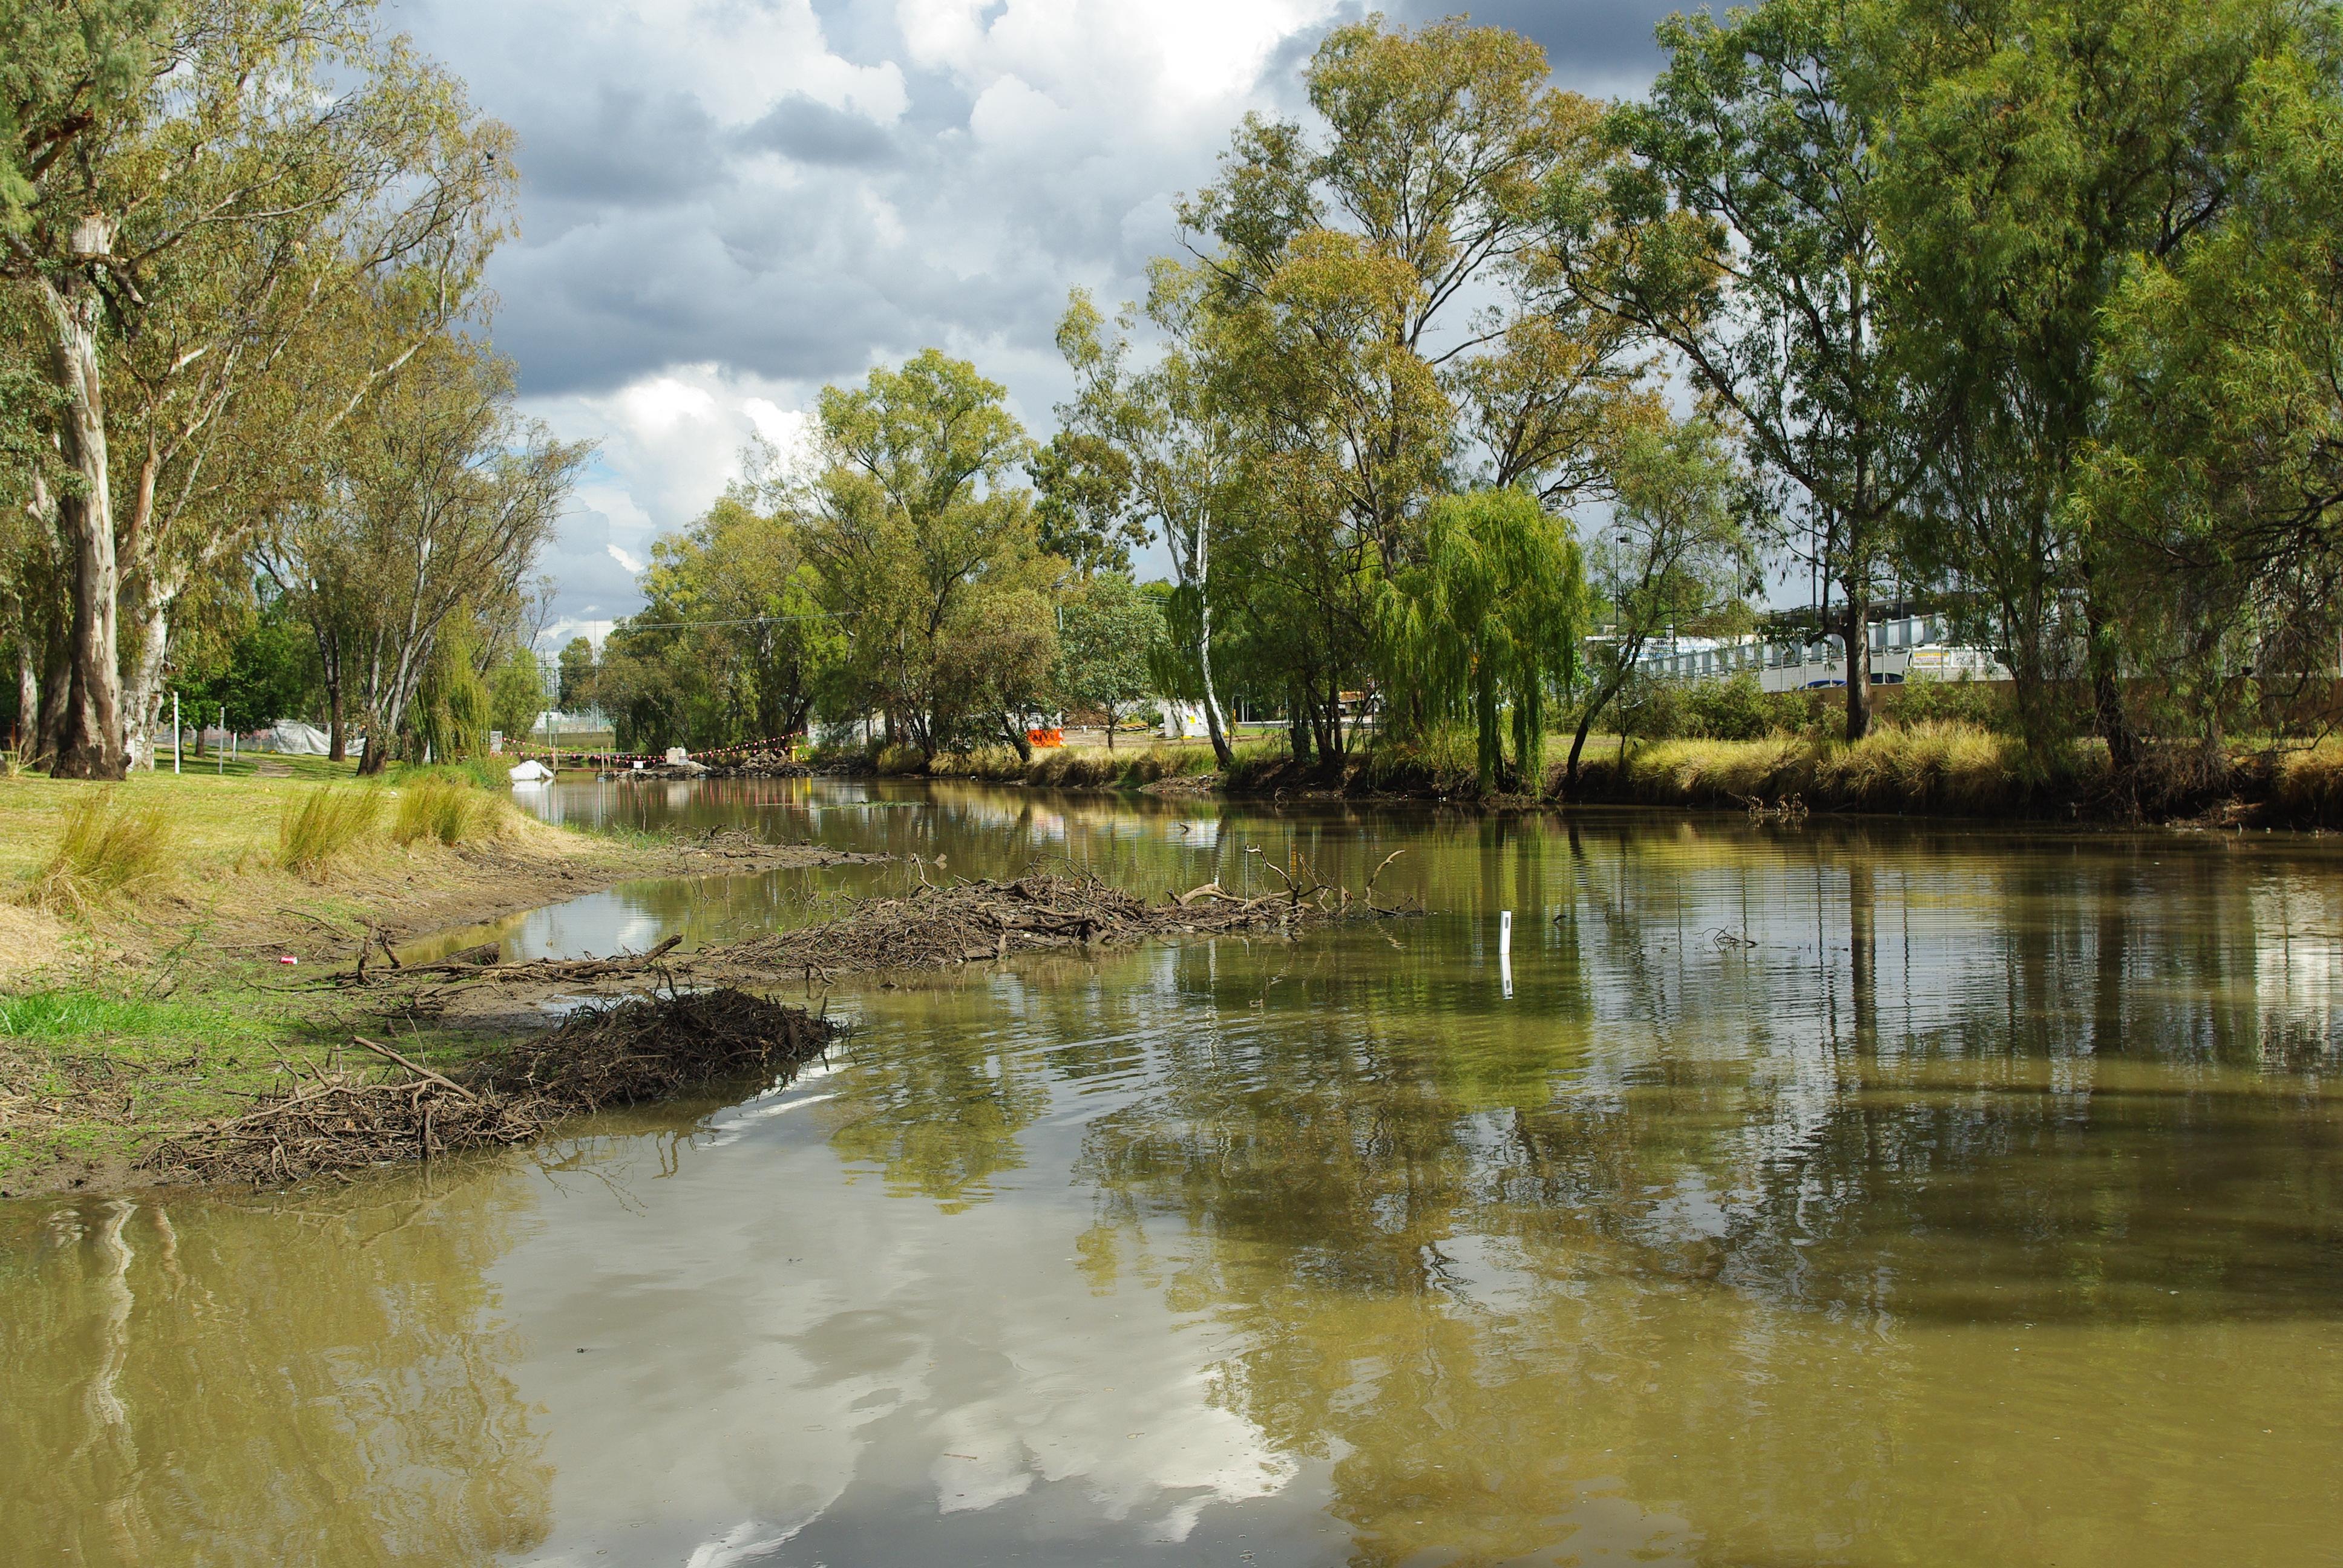 Image 1 - Myall Creek prior to restoration